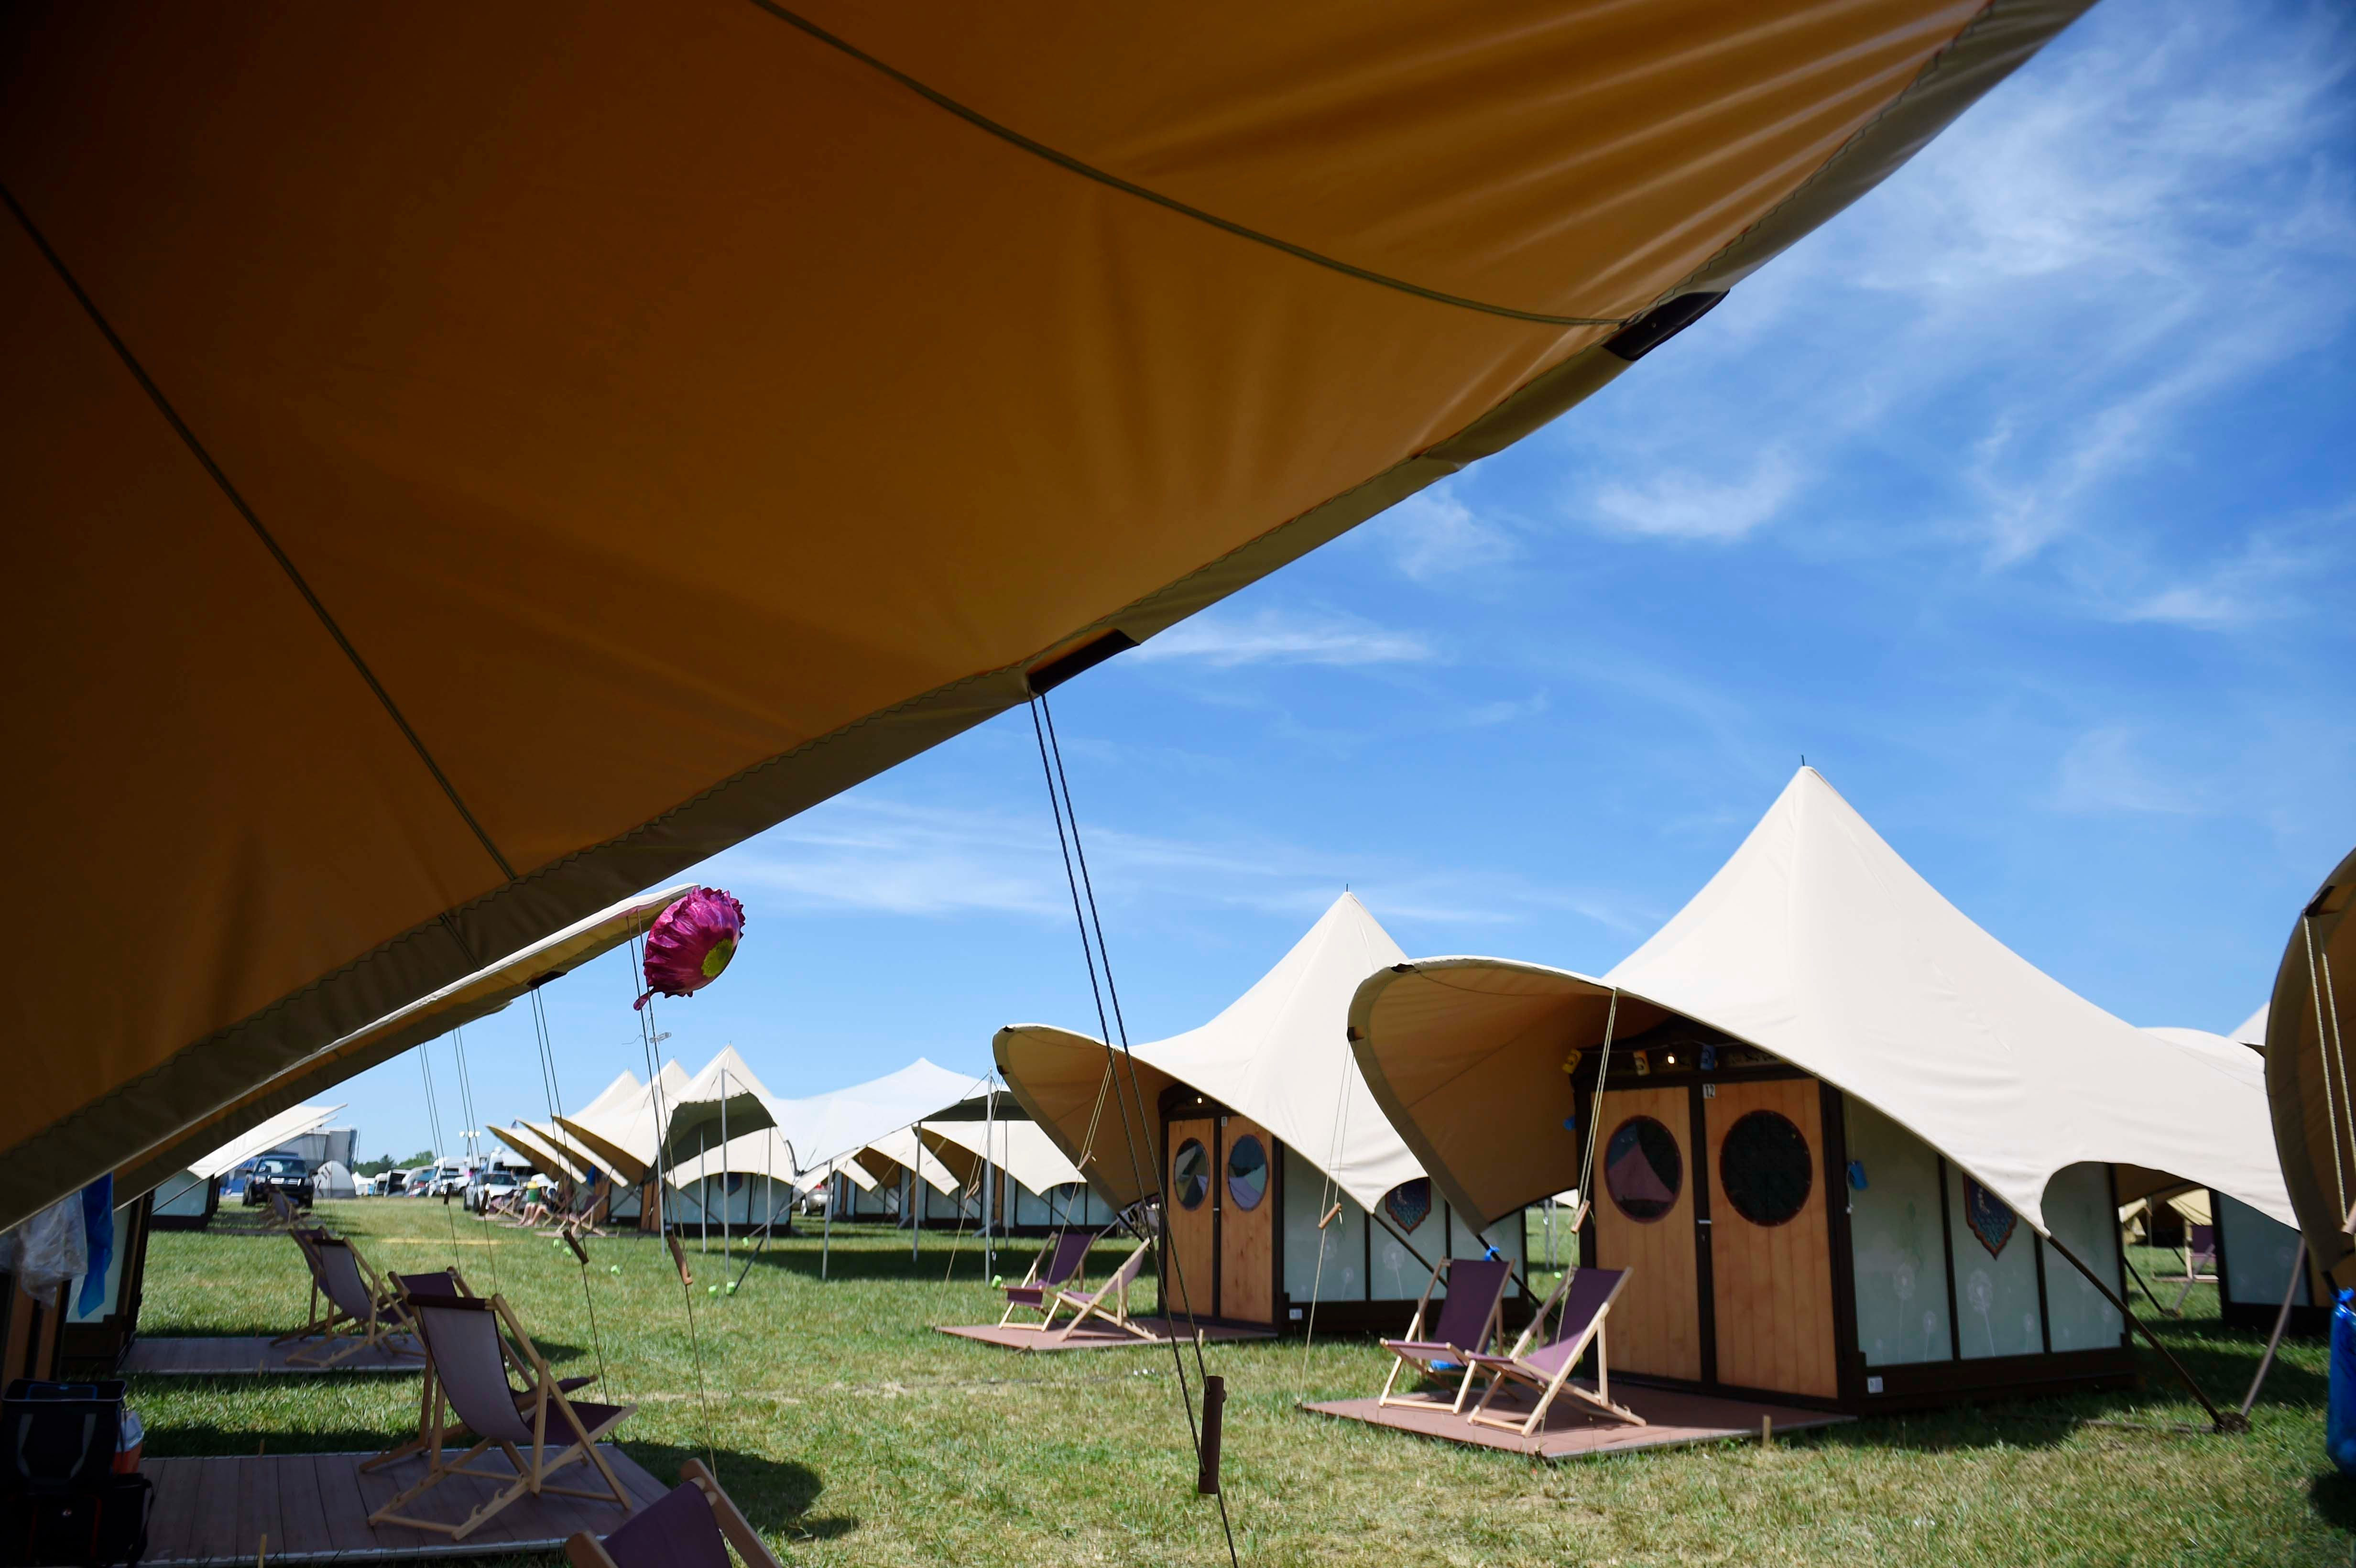 636011665862573219-bonnaroo-sam-crib-11.jpg & Bonnaroo 2016: Most outrageous tent setups at the farm